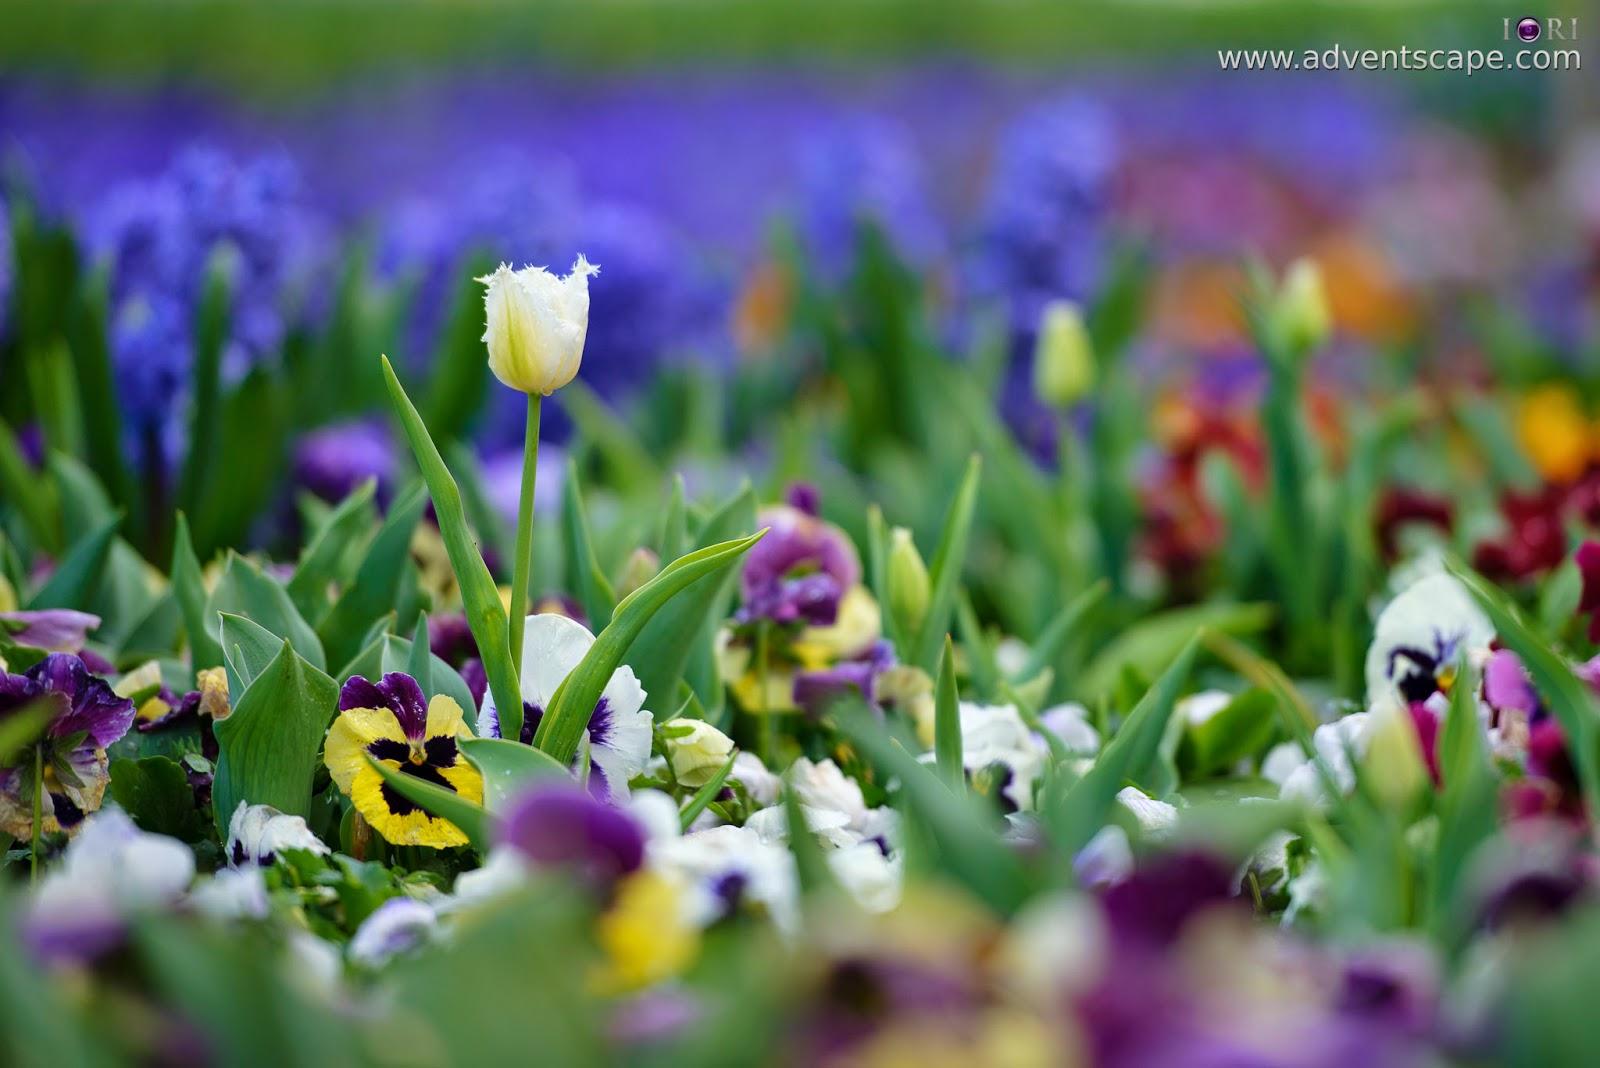 Philip Avellana, iori, advenscape, Floriade, 2014, spring festival, Canberra, ACT, Australian Capital Territory, park, flowers, blossom, alone